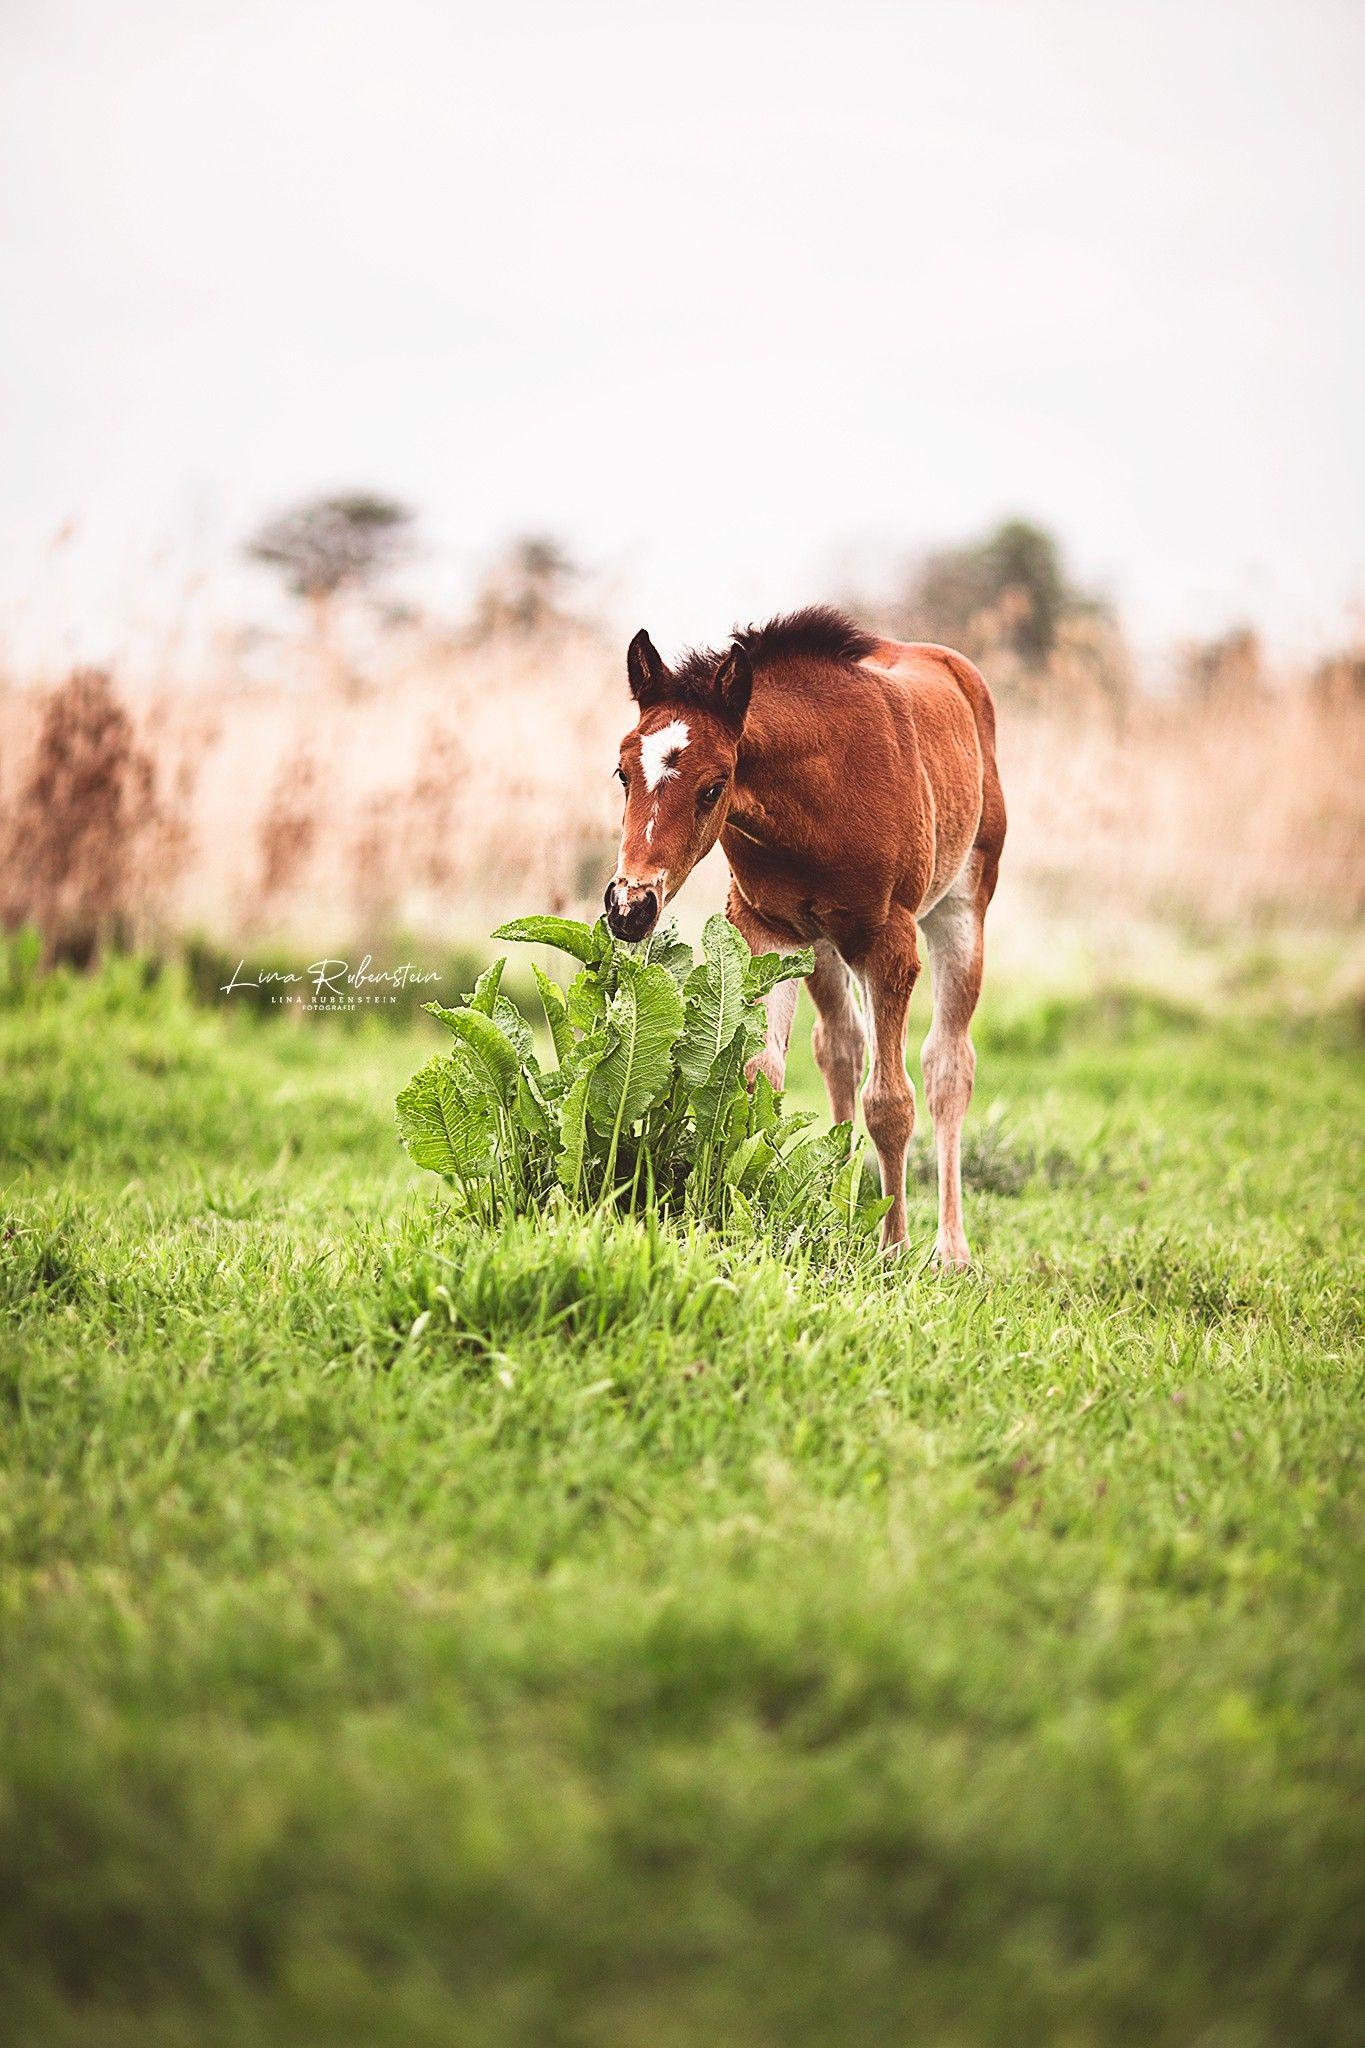 Junges Fohlen Knabbert An Gestrupp Pferde Fotografie Fohlen Pferdefotografie